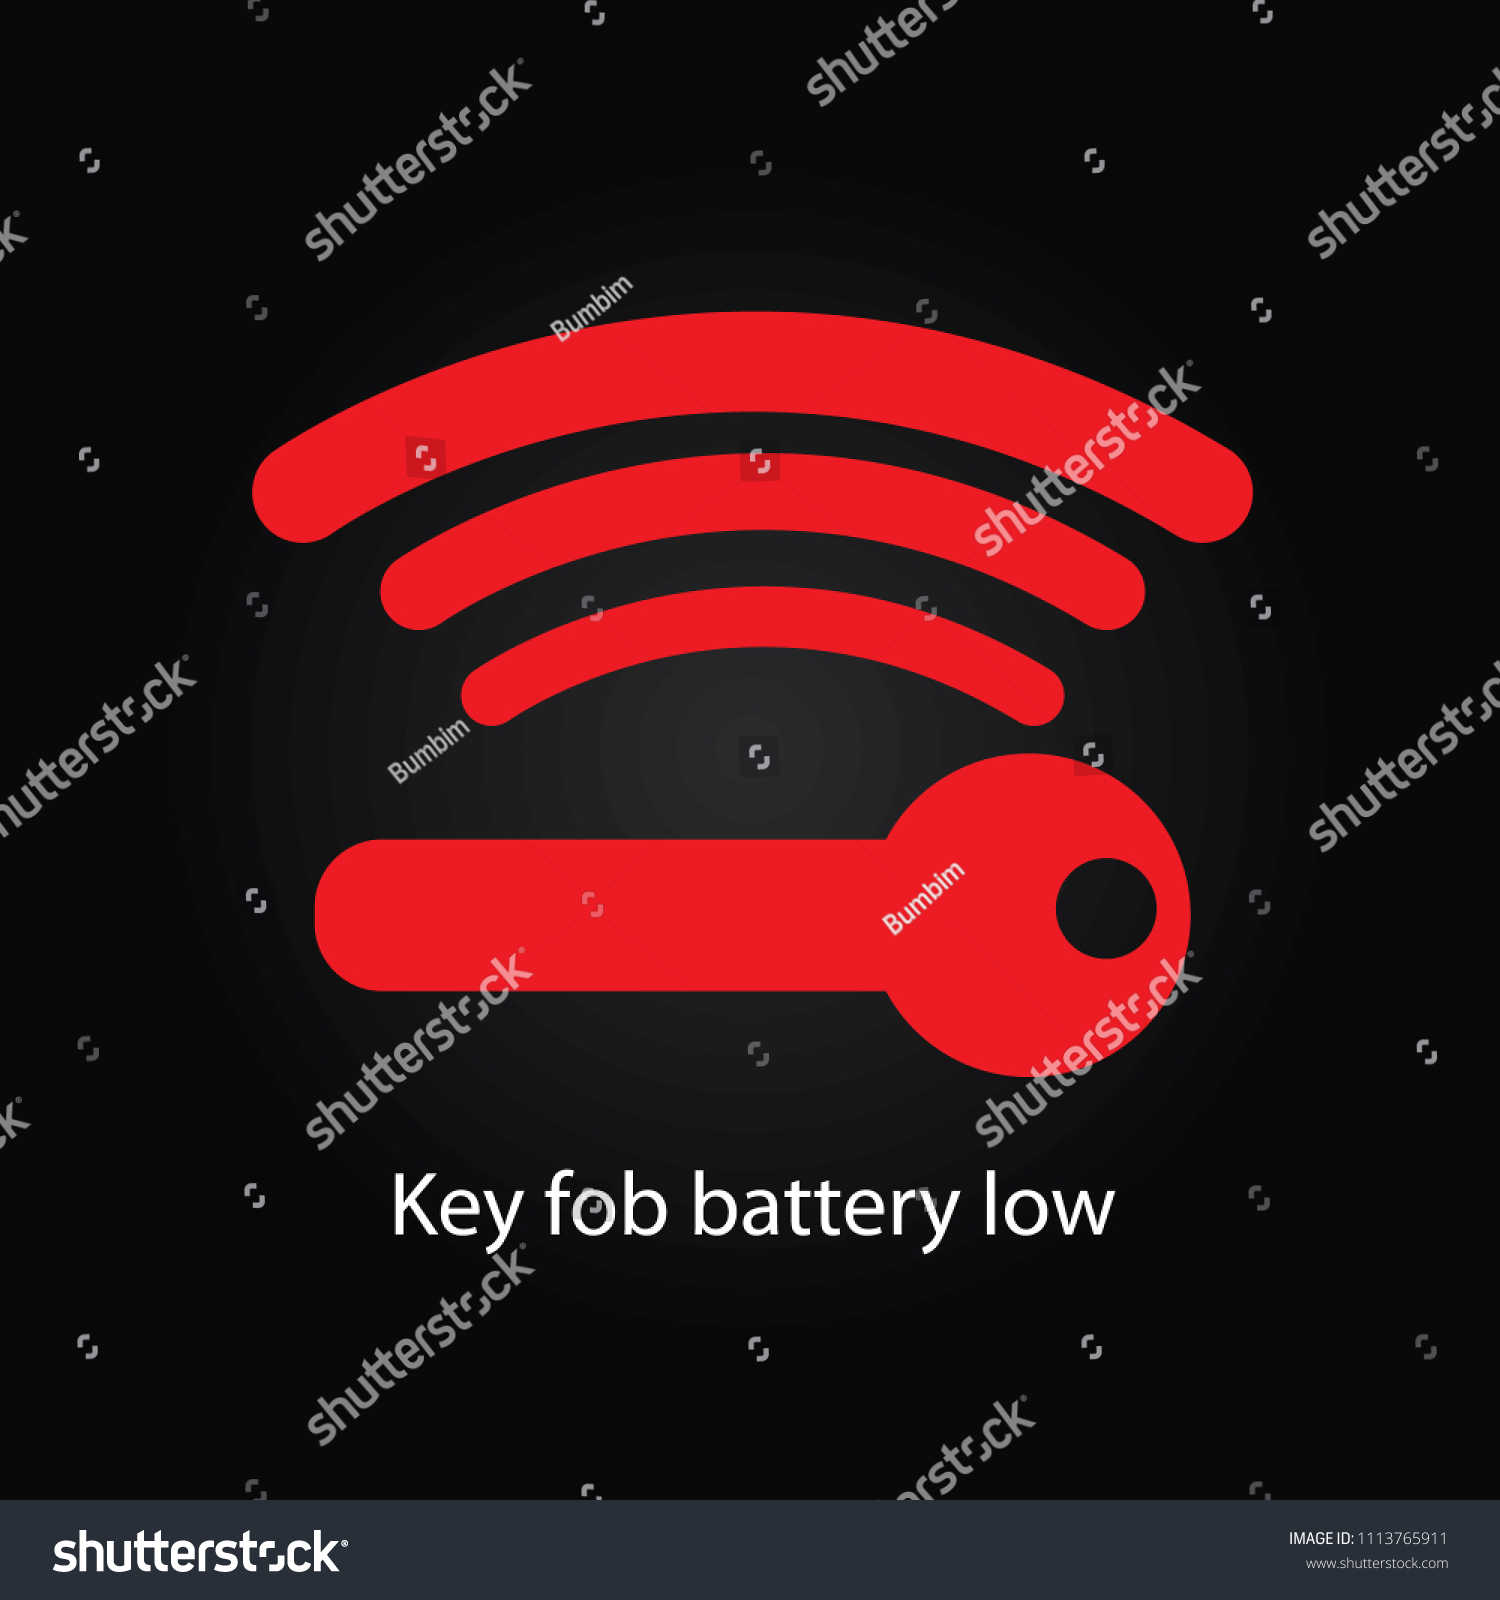 Key Fob Battery Low >> Key Fob Battery Low Stock Illustration 1113765911